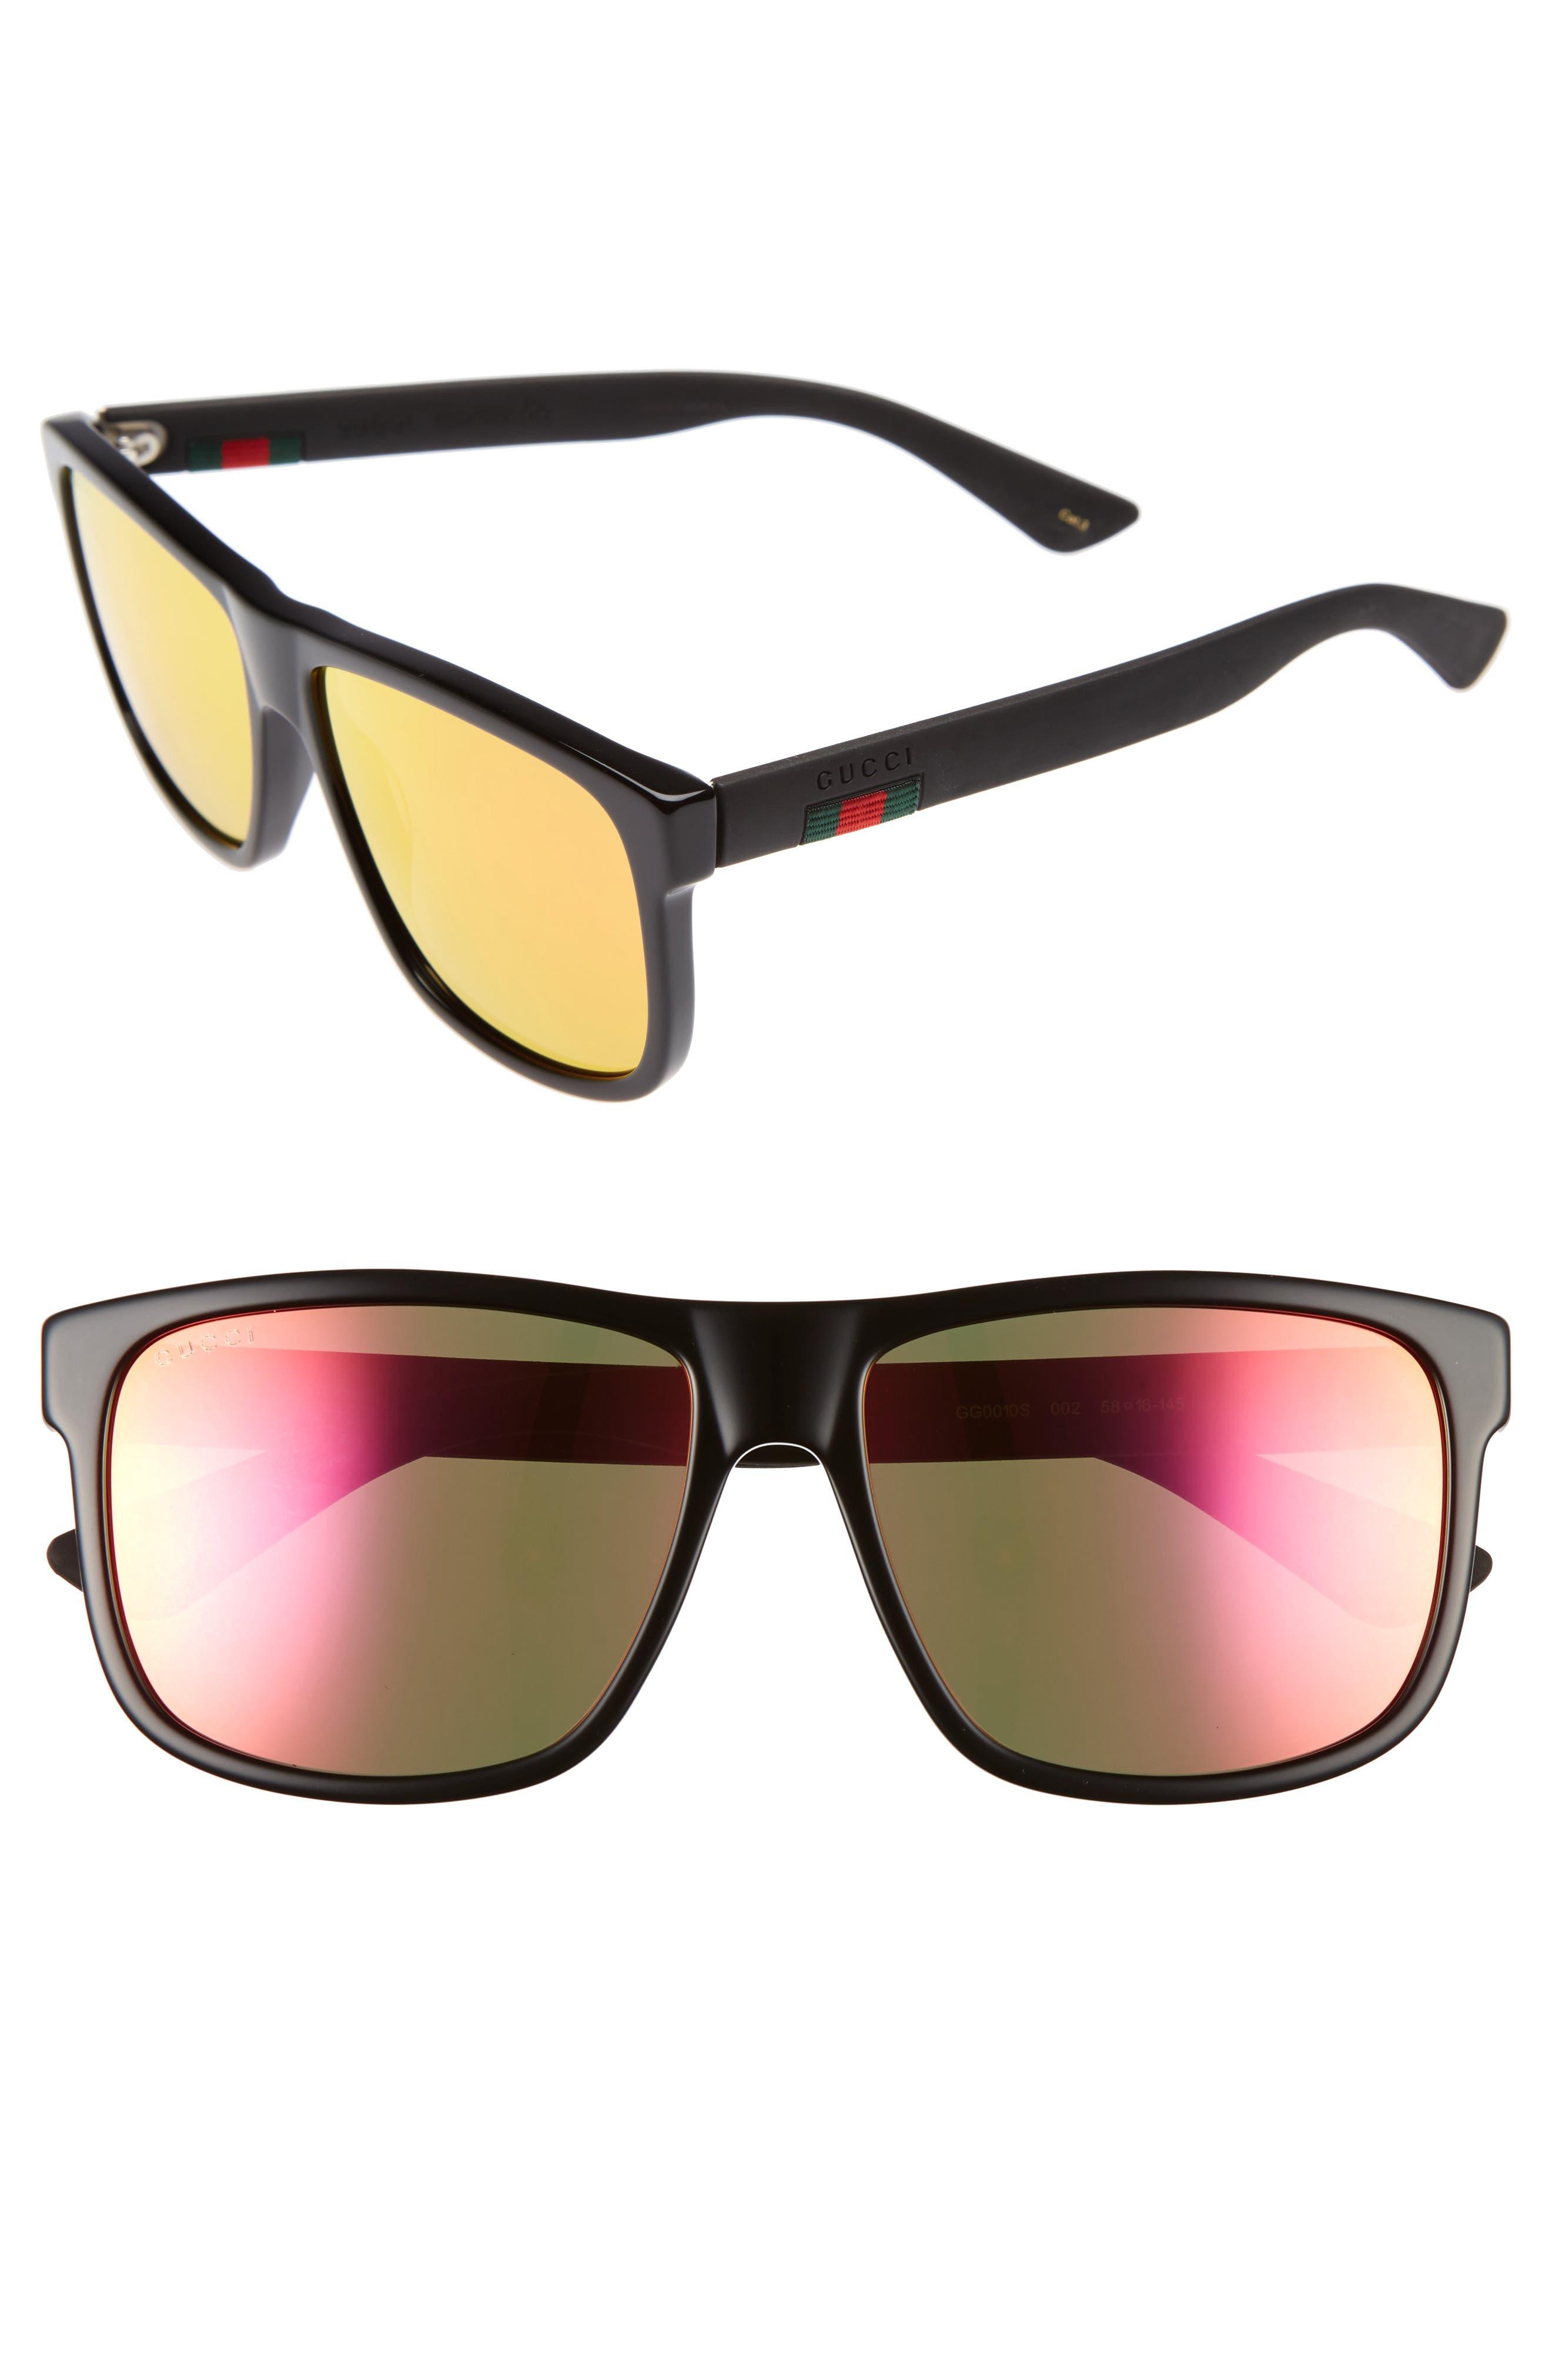 GUCCI, 58mm Sunglasses, Main thumbnail 1, color, BLACK W/ RED MIRROR LENS